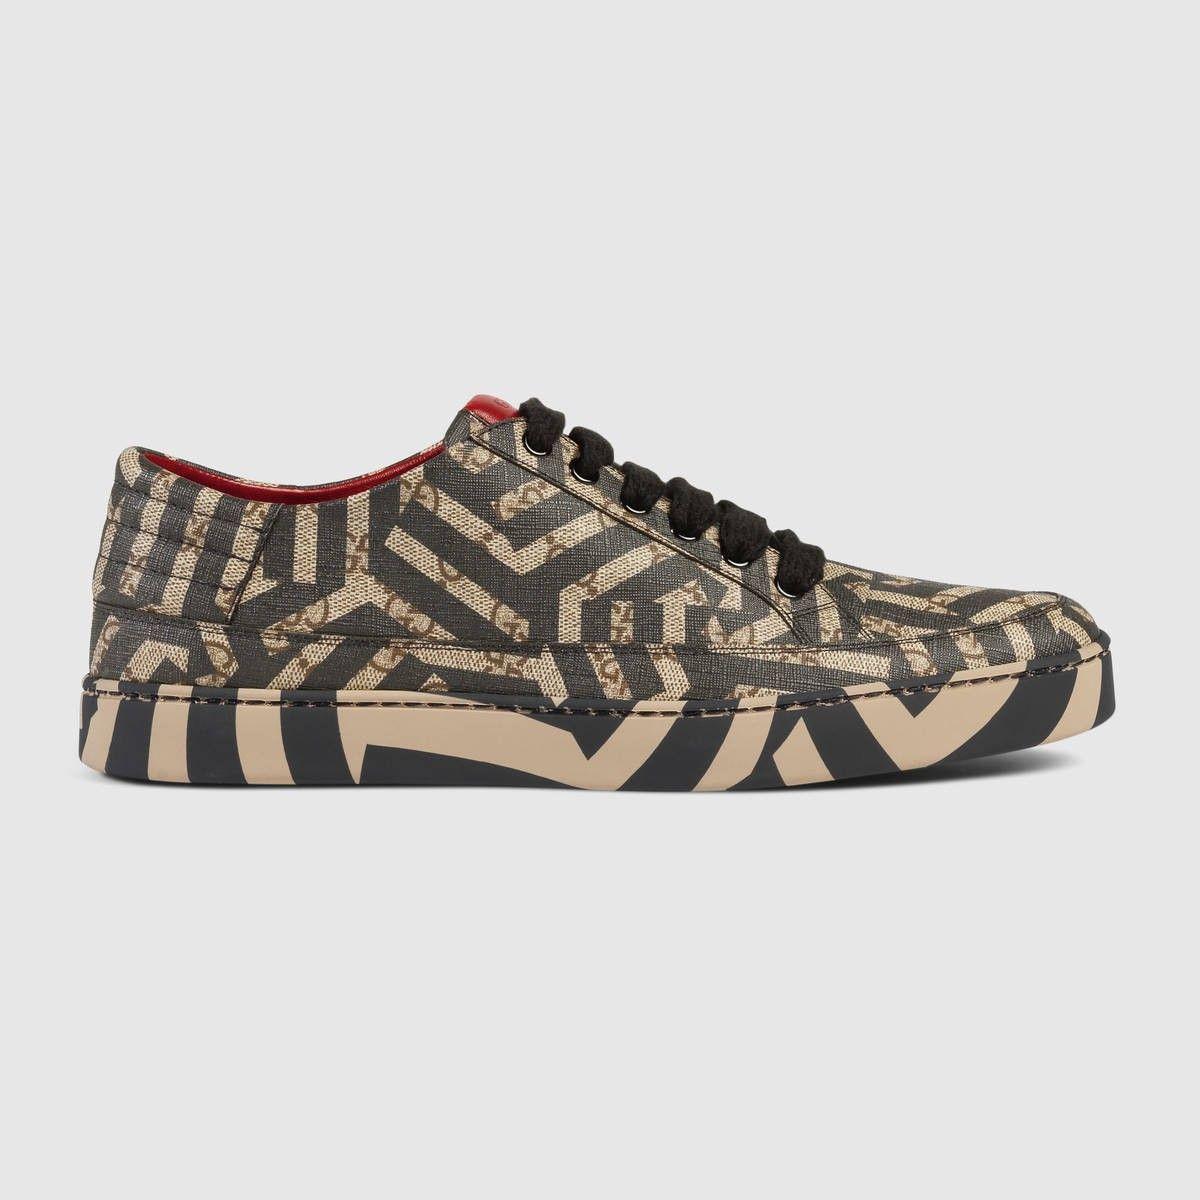 82bb17f37c684 GUCCI Gg Caleido Low-Top Sneaker - Gg Caleido.  gucci  shoes  all ...